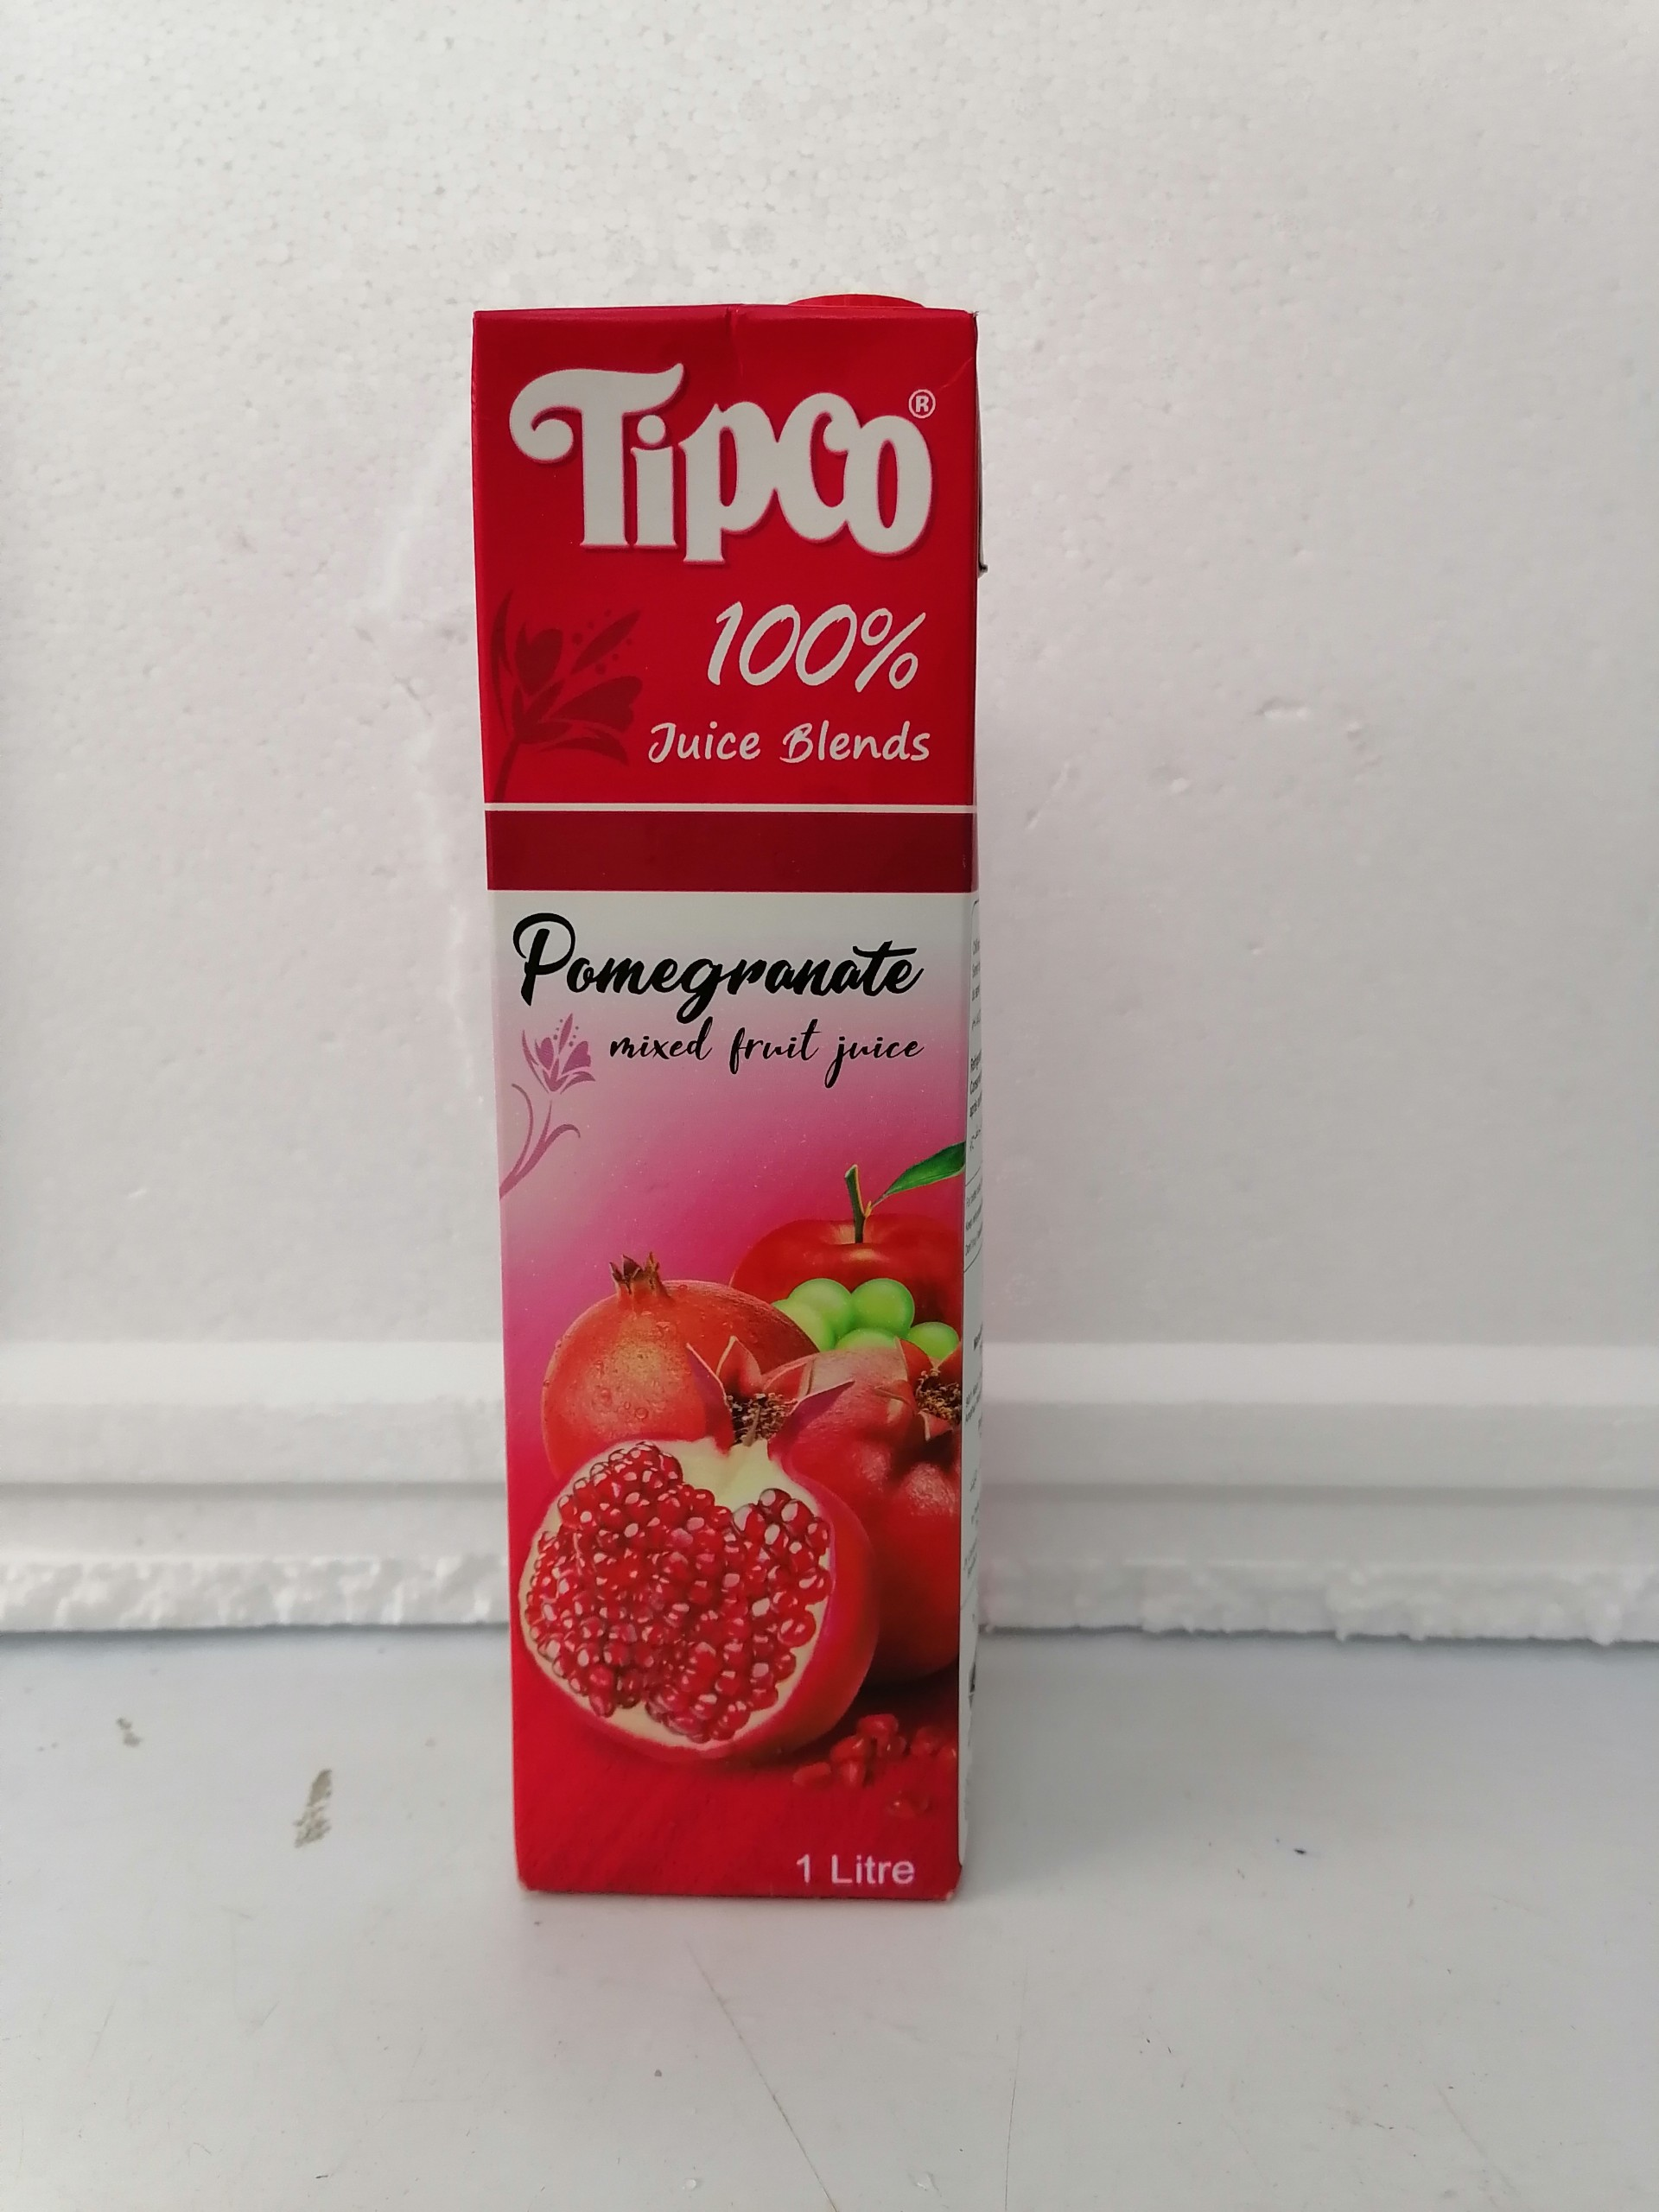 Nước ép TIPCO Lựu và trái cây 100% Pomegranate and Mixed Fruit Juice 1 Lít (halal)